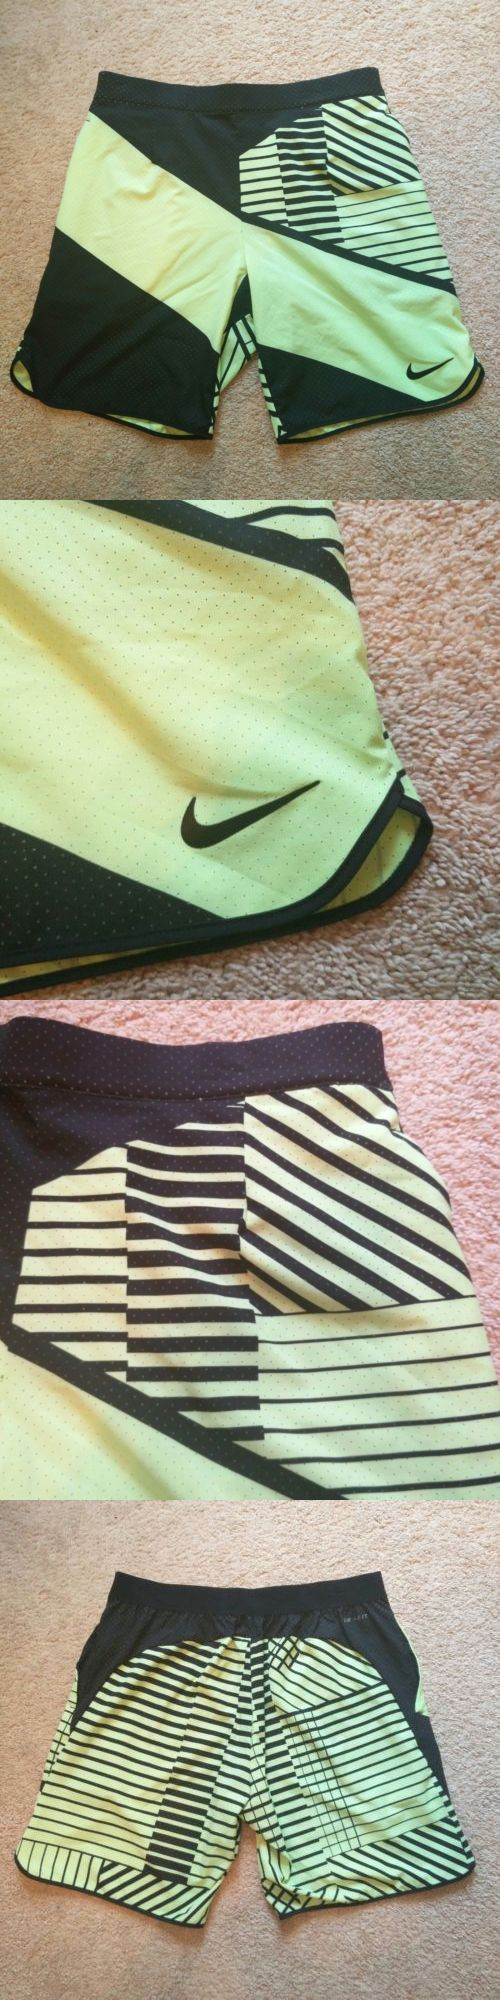 Shorts 70902: Nike Dri-Fit Flex Nadal Tennis Shorts Mens L New -> BUY IT NOW ONLY: $49.99 on eBay!